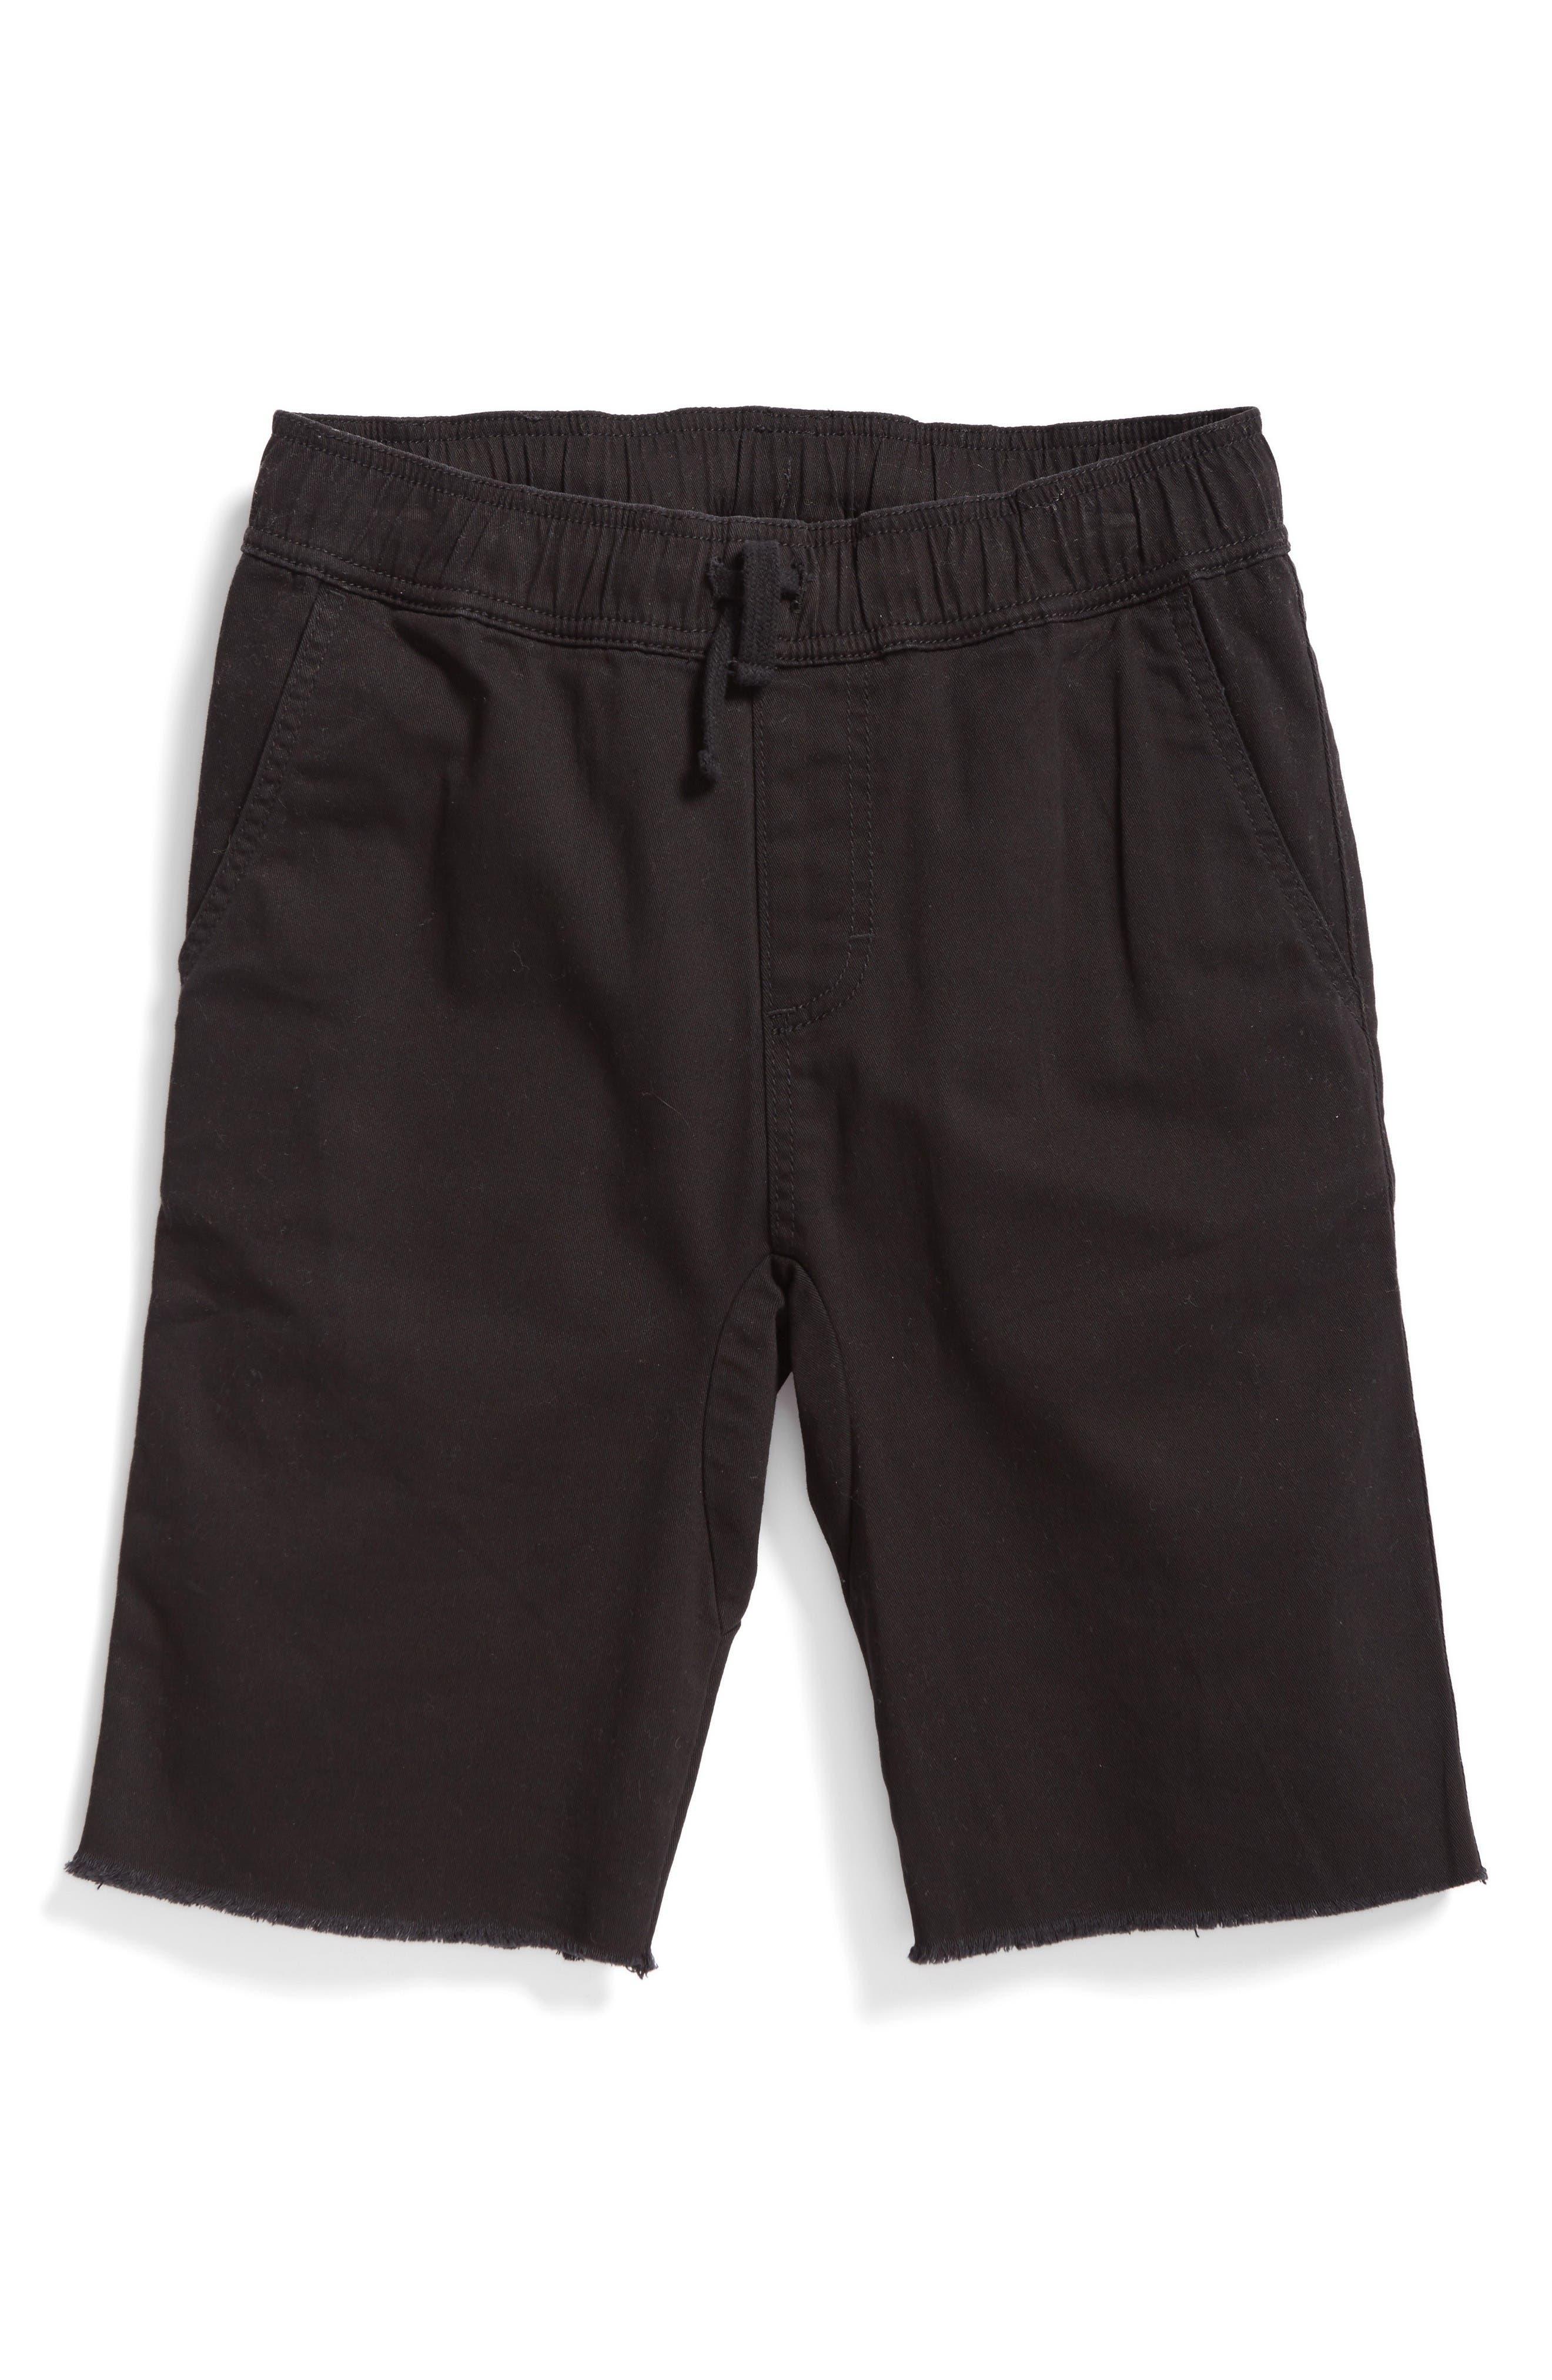 Alternate Image 1 Selected - Tucker + Tate Jogger Shorts (Big Boys)